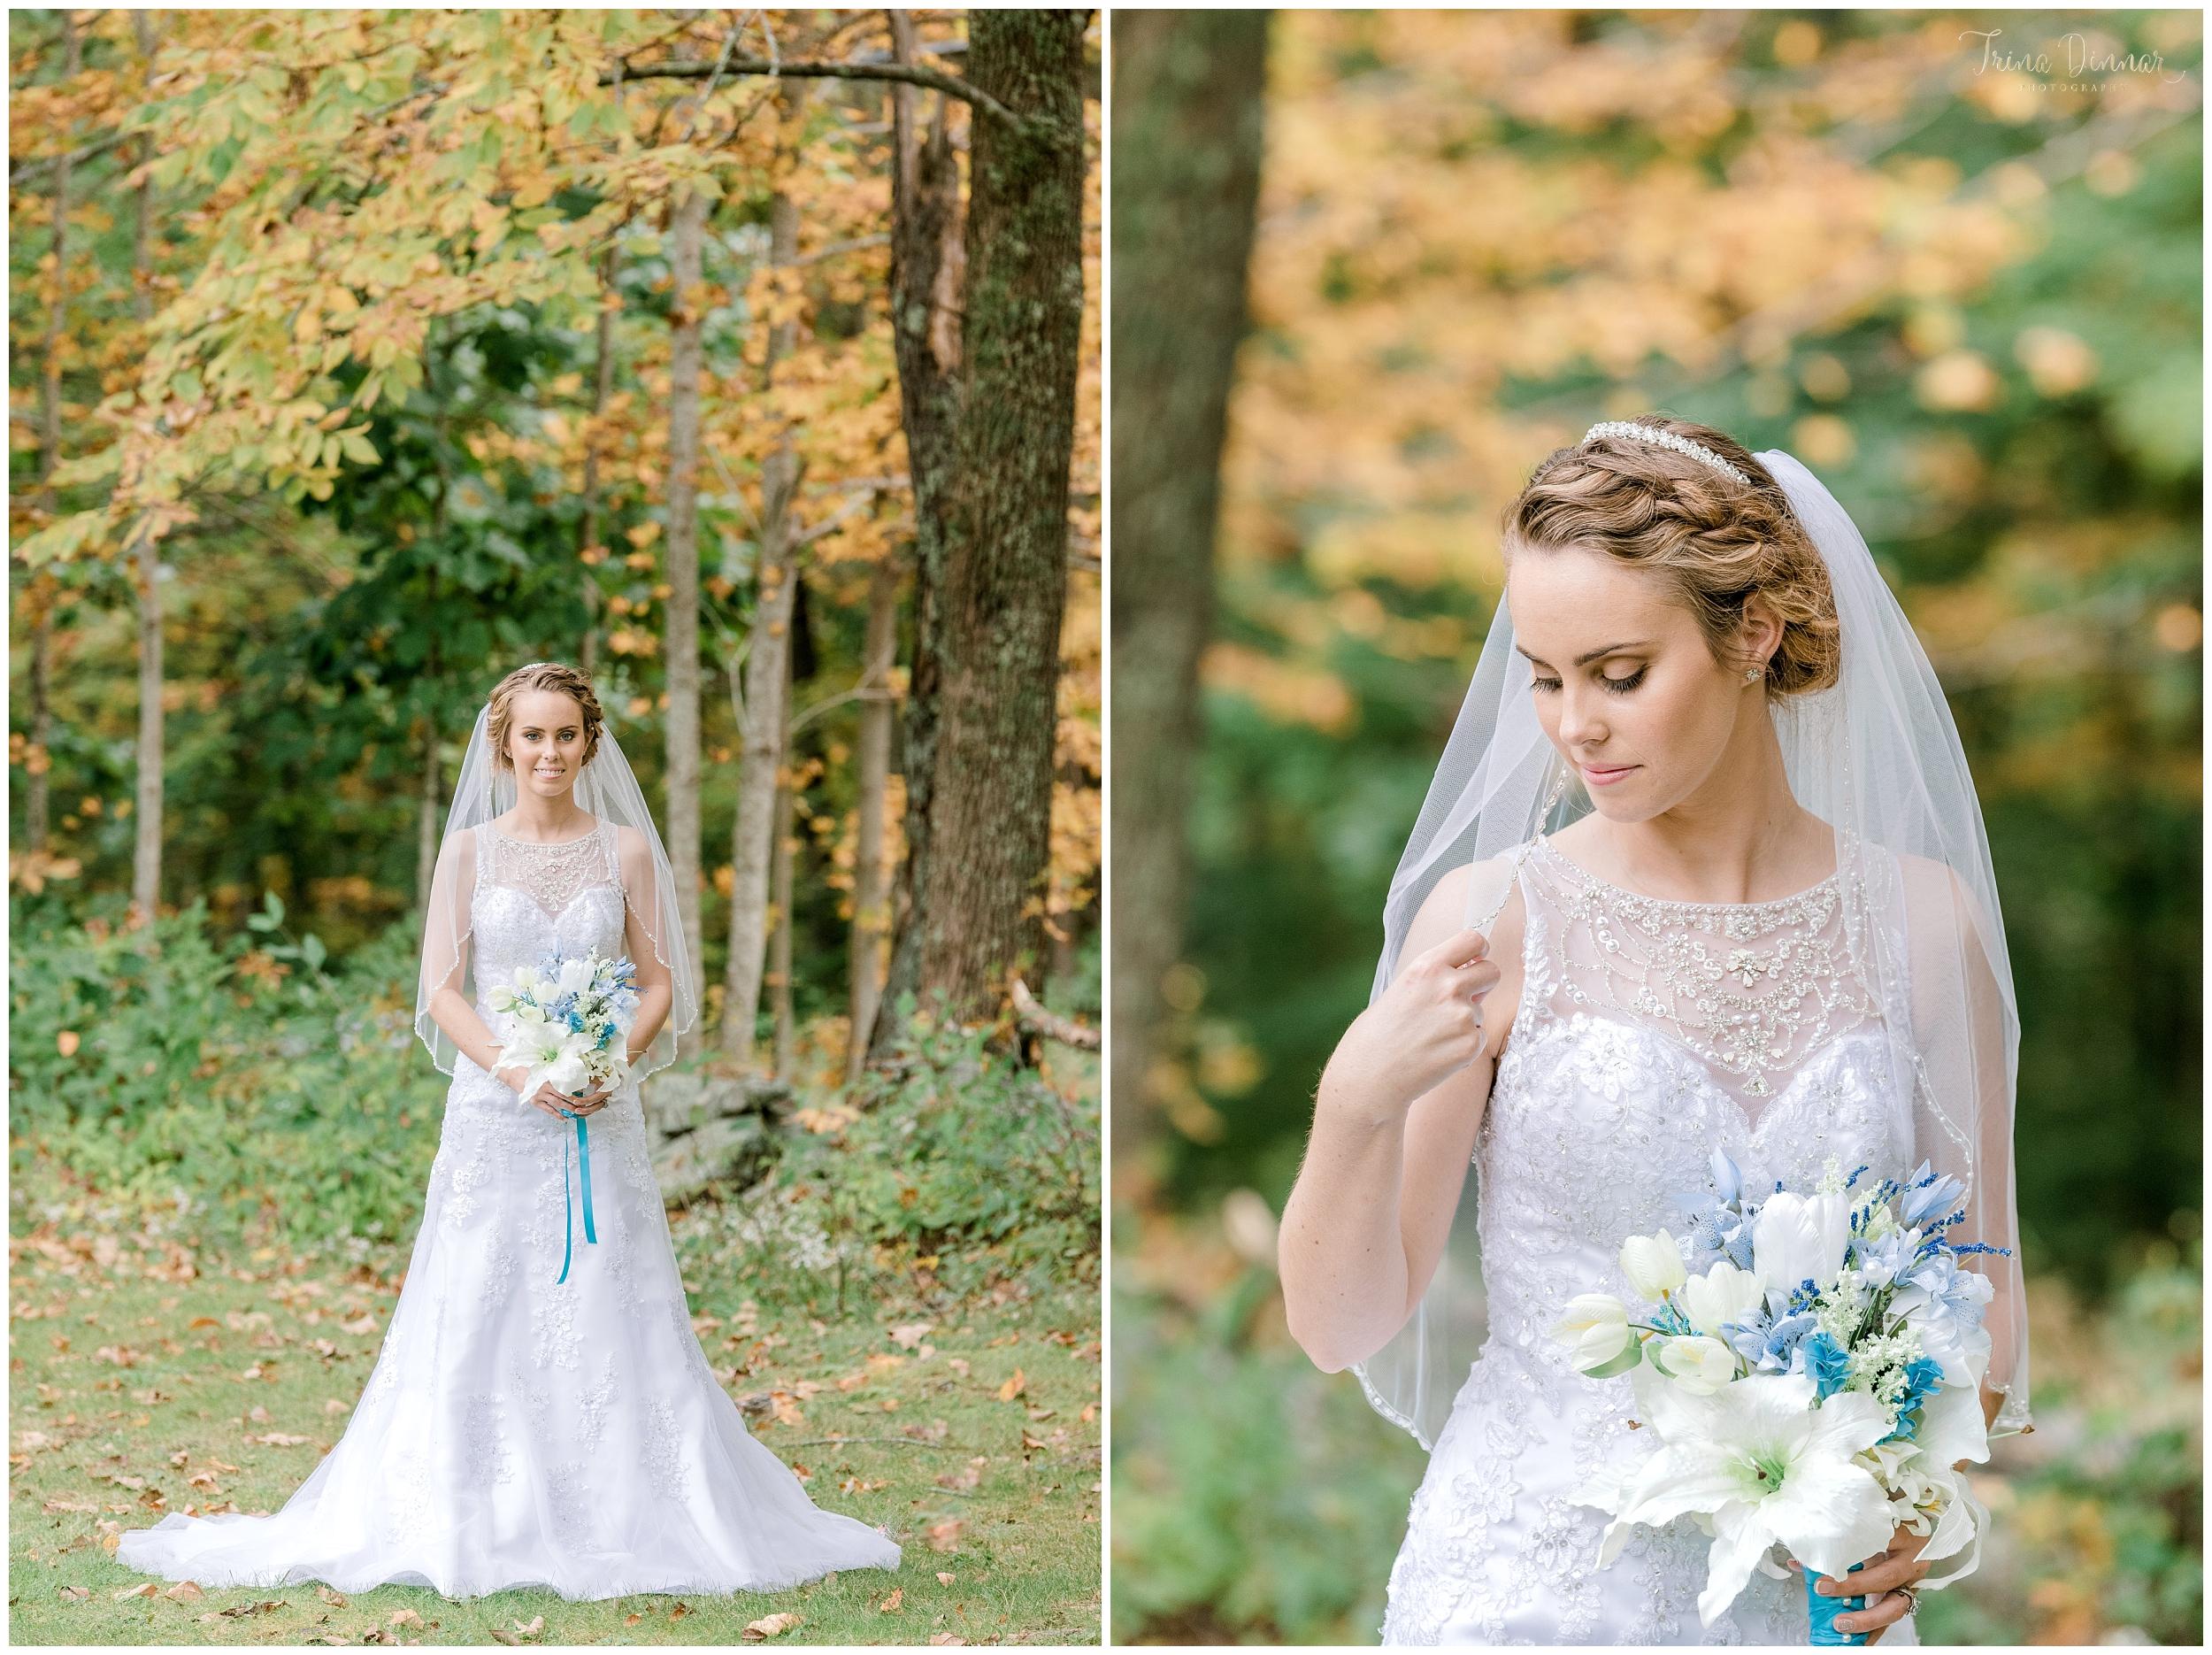 Bridal portrait photography at Clay Hill Farm ME Wedding.